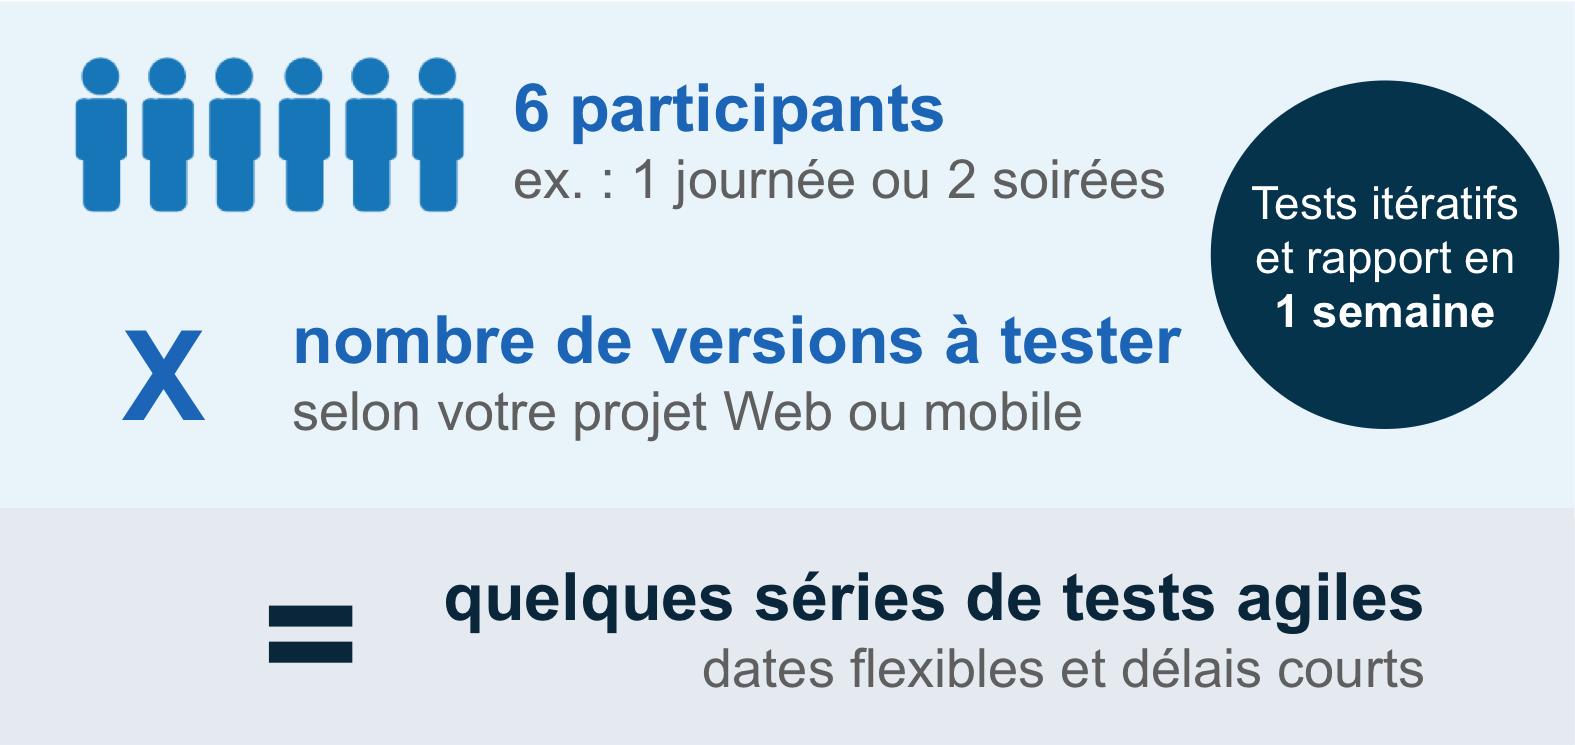 Tests utilisateurs agiles